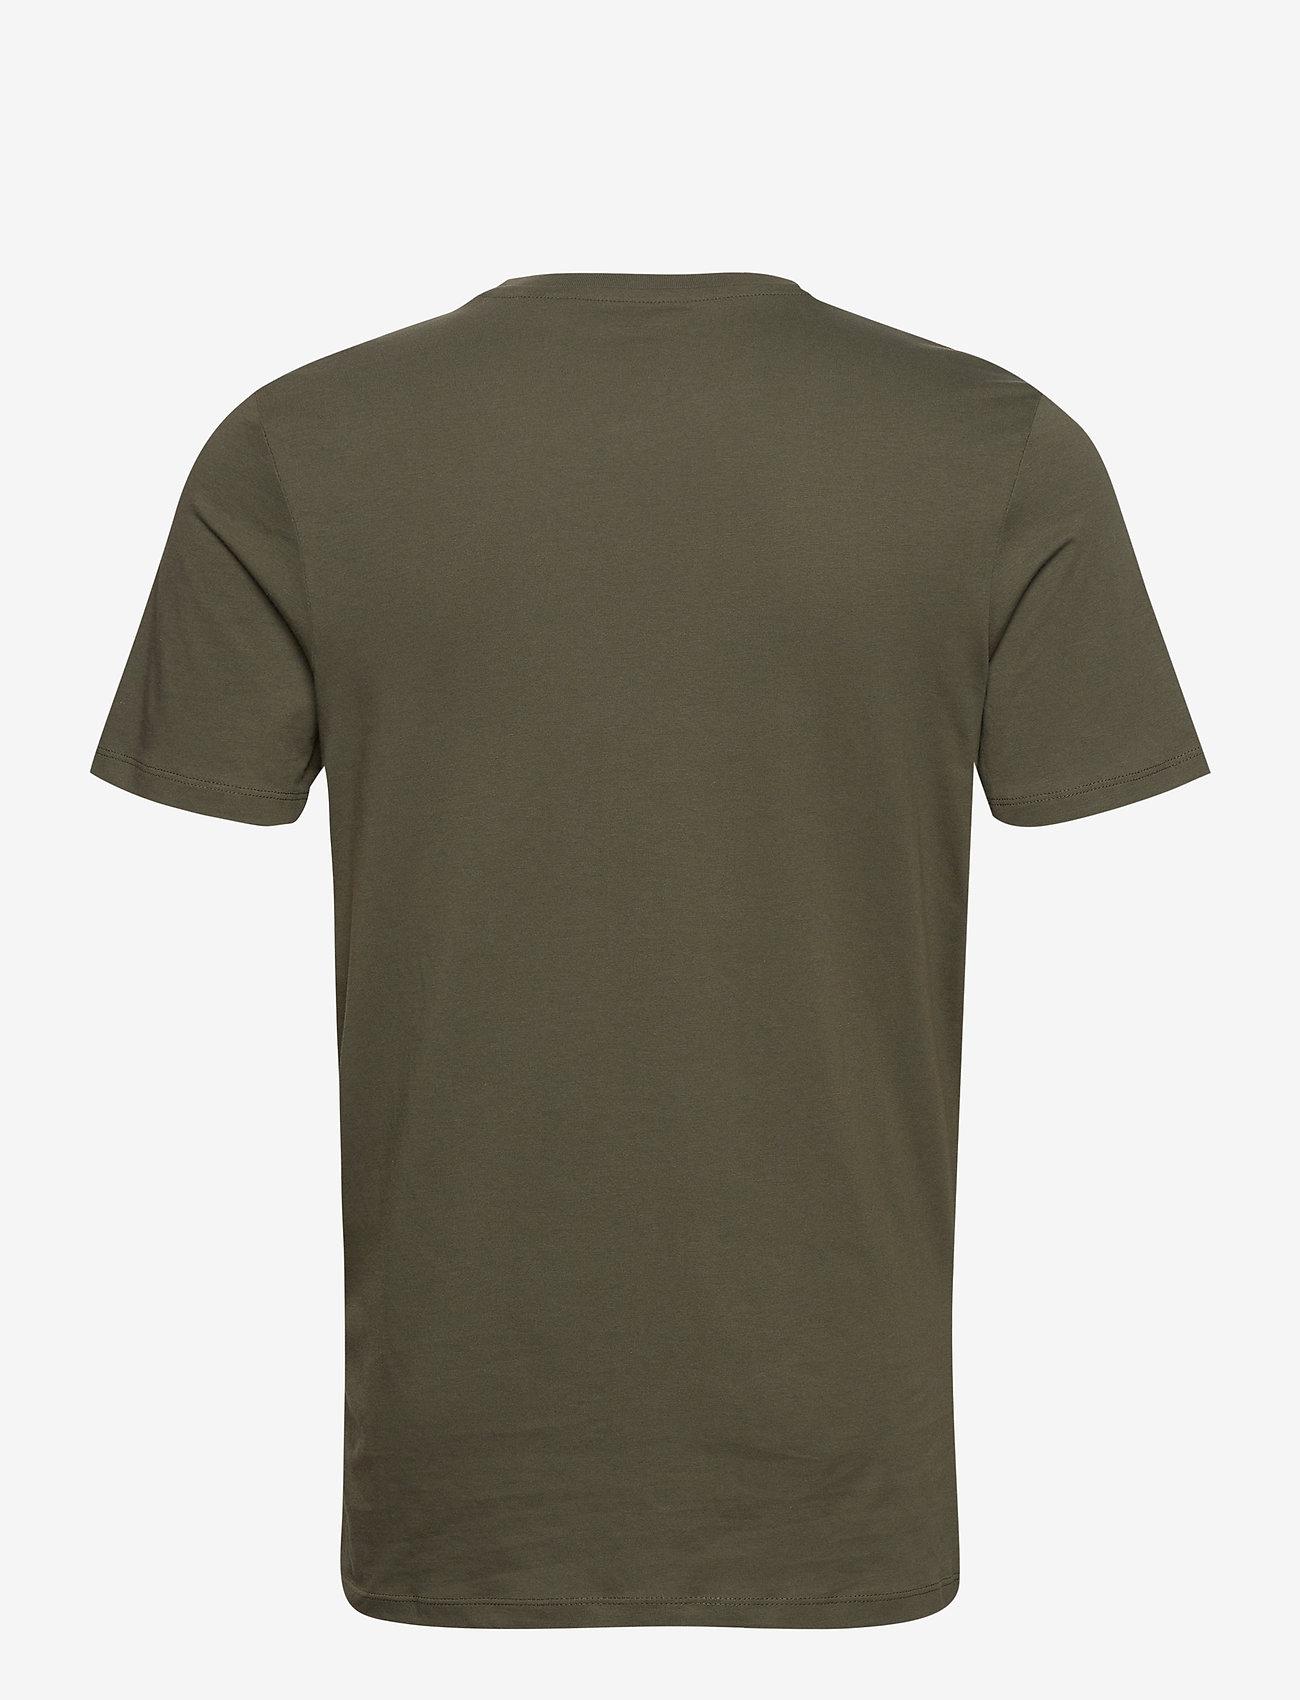 Jack & Jones - JJELOGO TEE SS O-NECK 2 COL AW20 - kortärmade t-shirts - forest night - 1